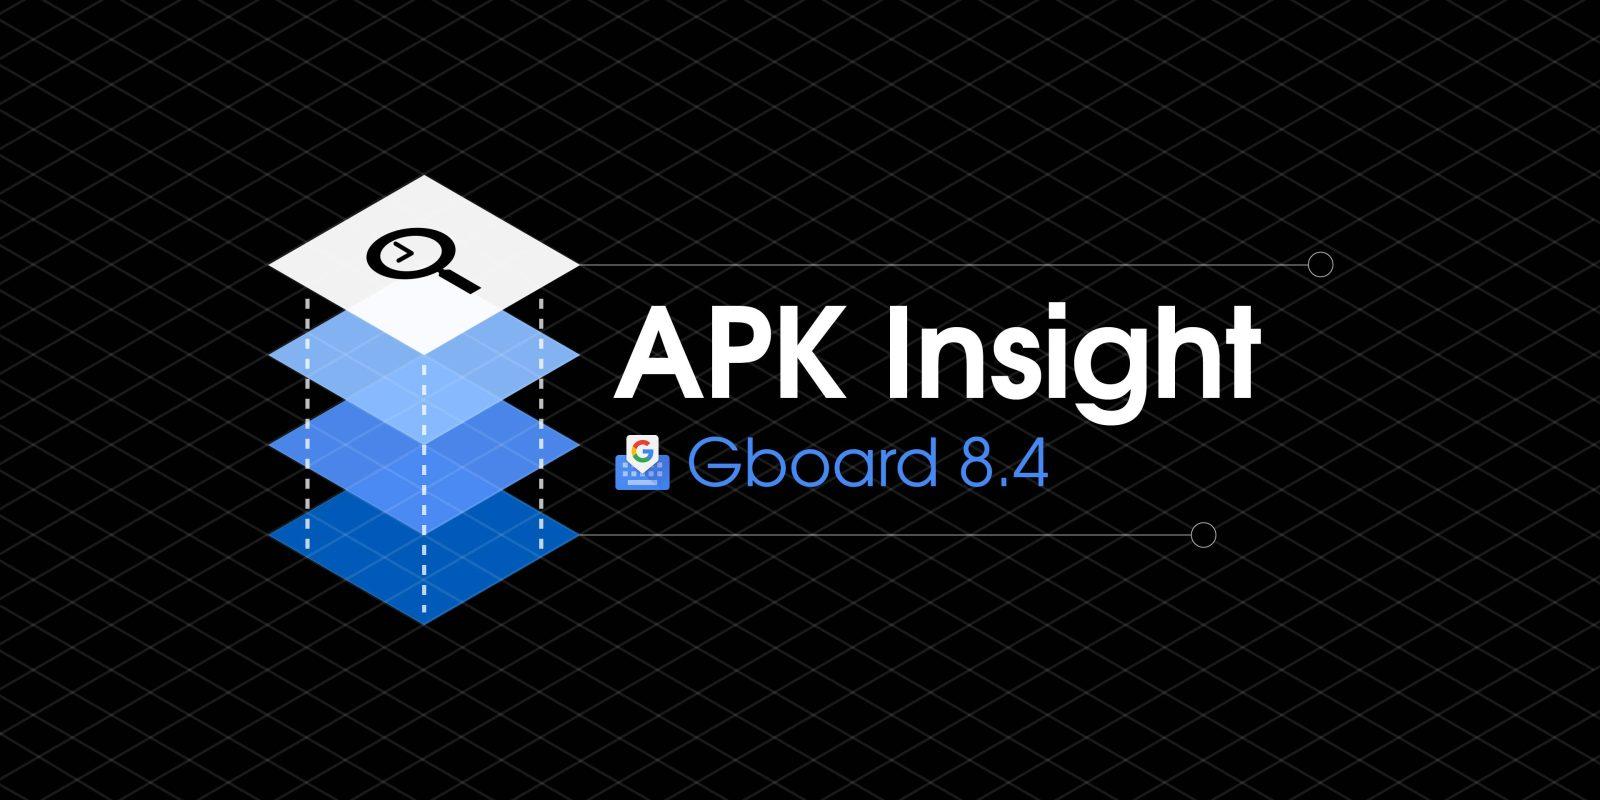 Gboard 8.4 reorganizes 'Symbols' emoji, preps trending sticker packs, more [APK Insight]